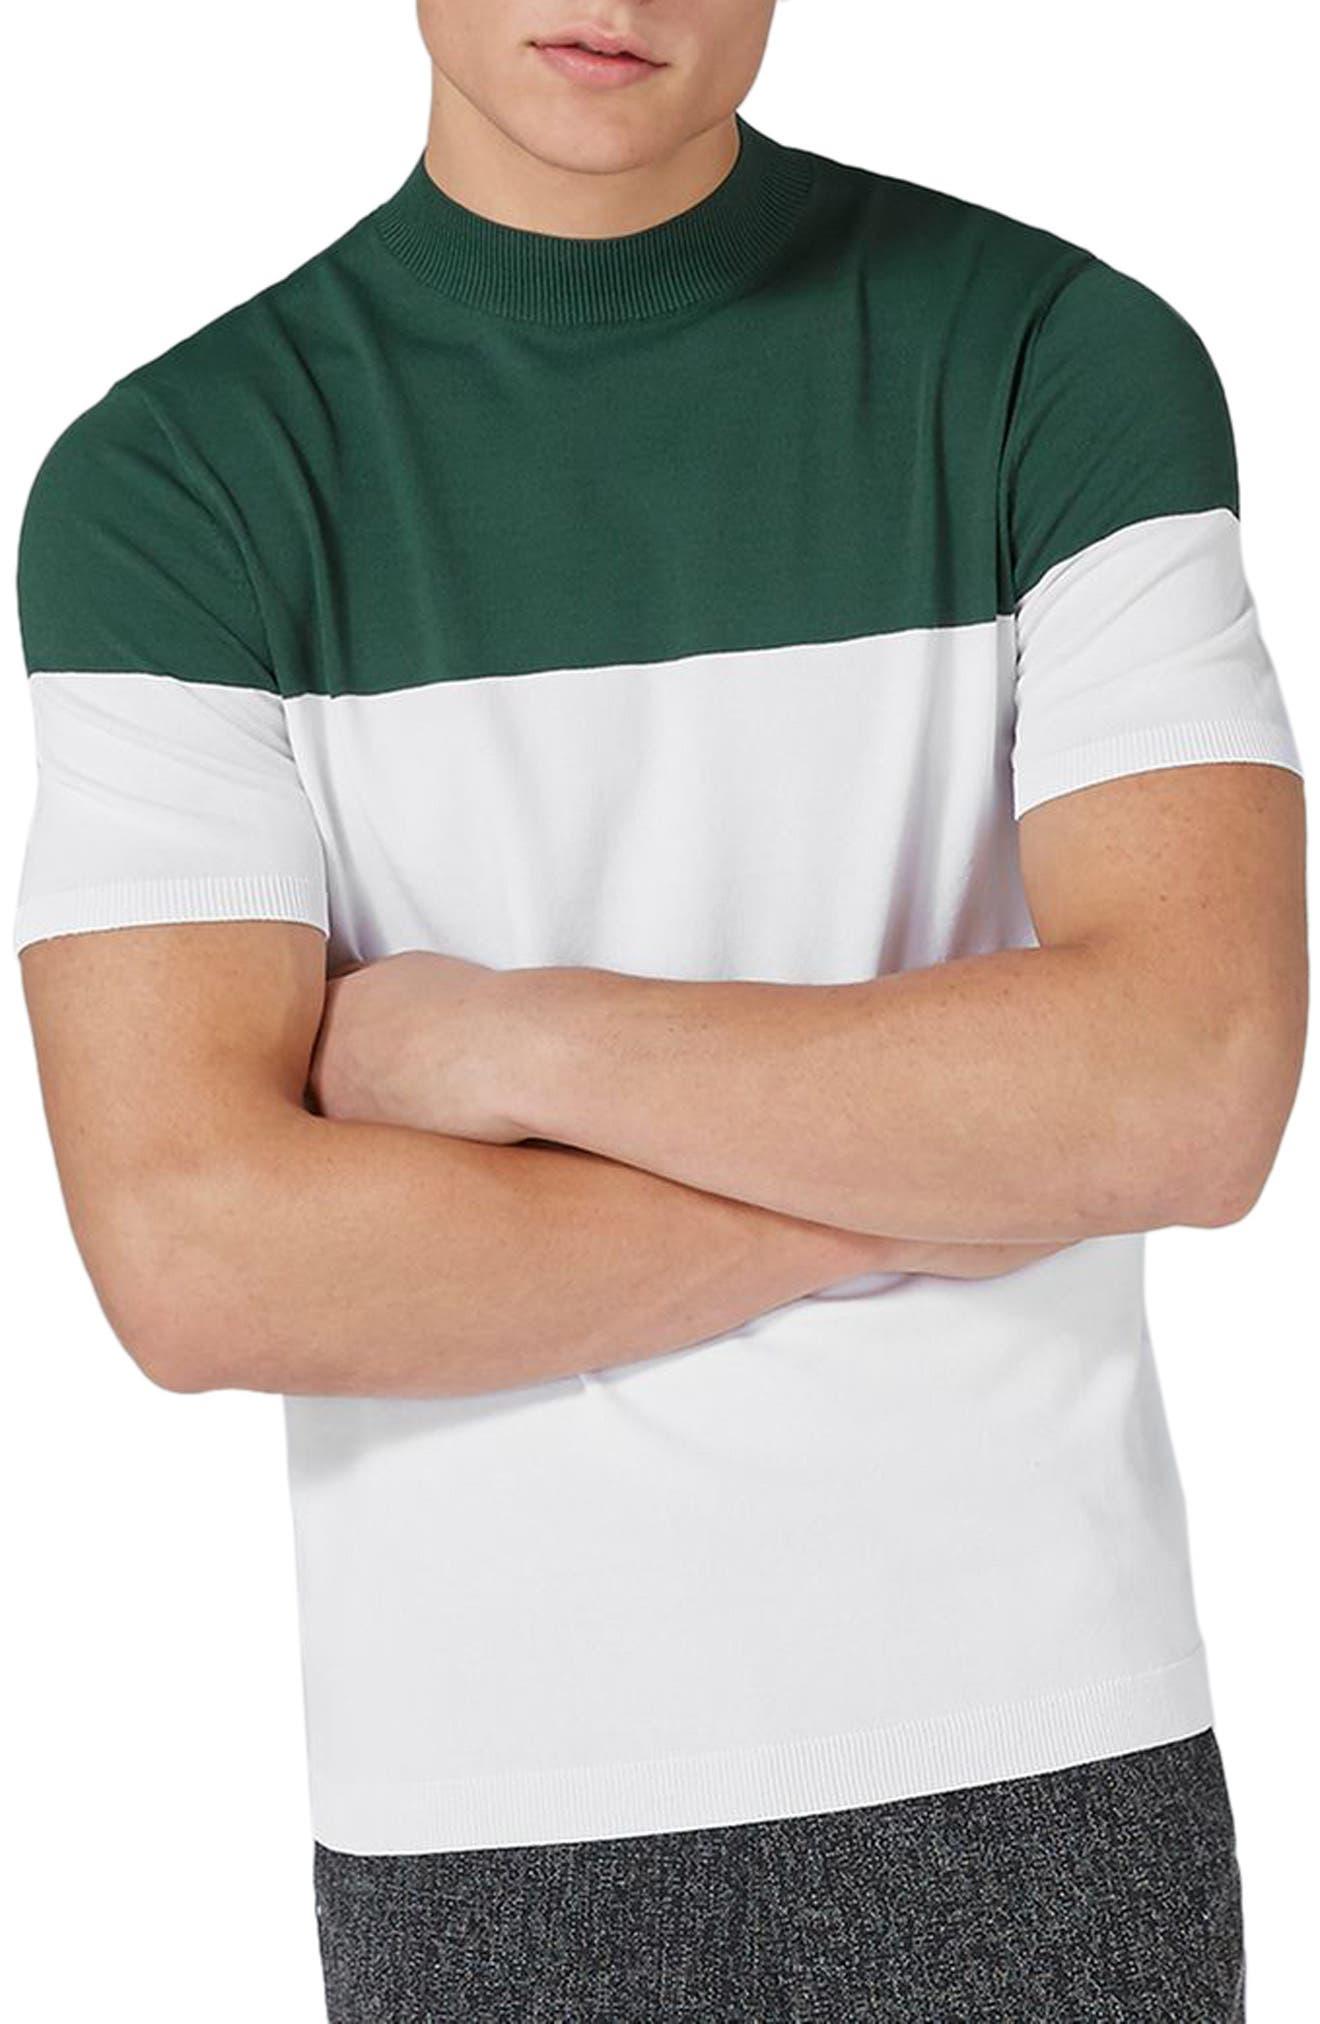 Colorblock Mock Neck Sweater,                             Main thumbnail 1, color,                             Green Multi